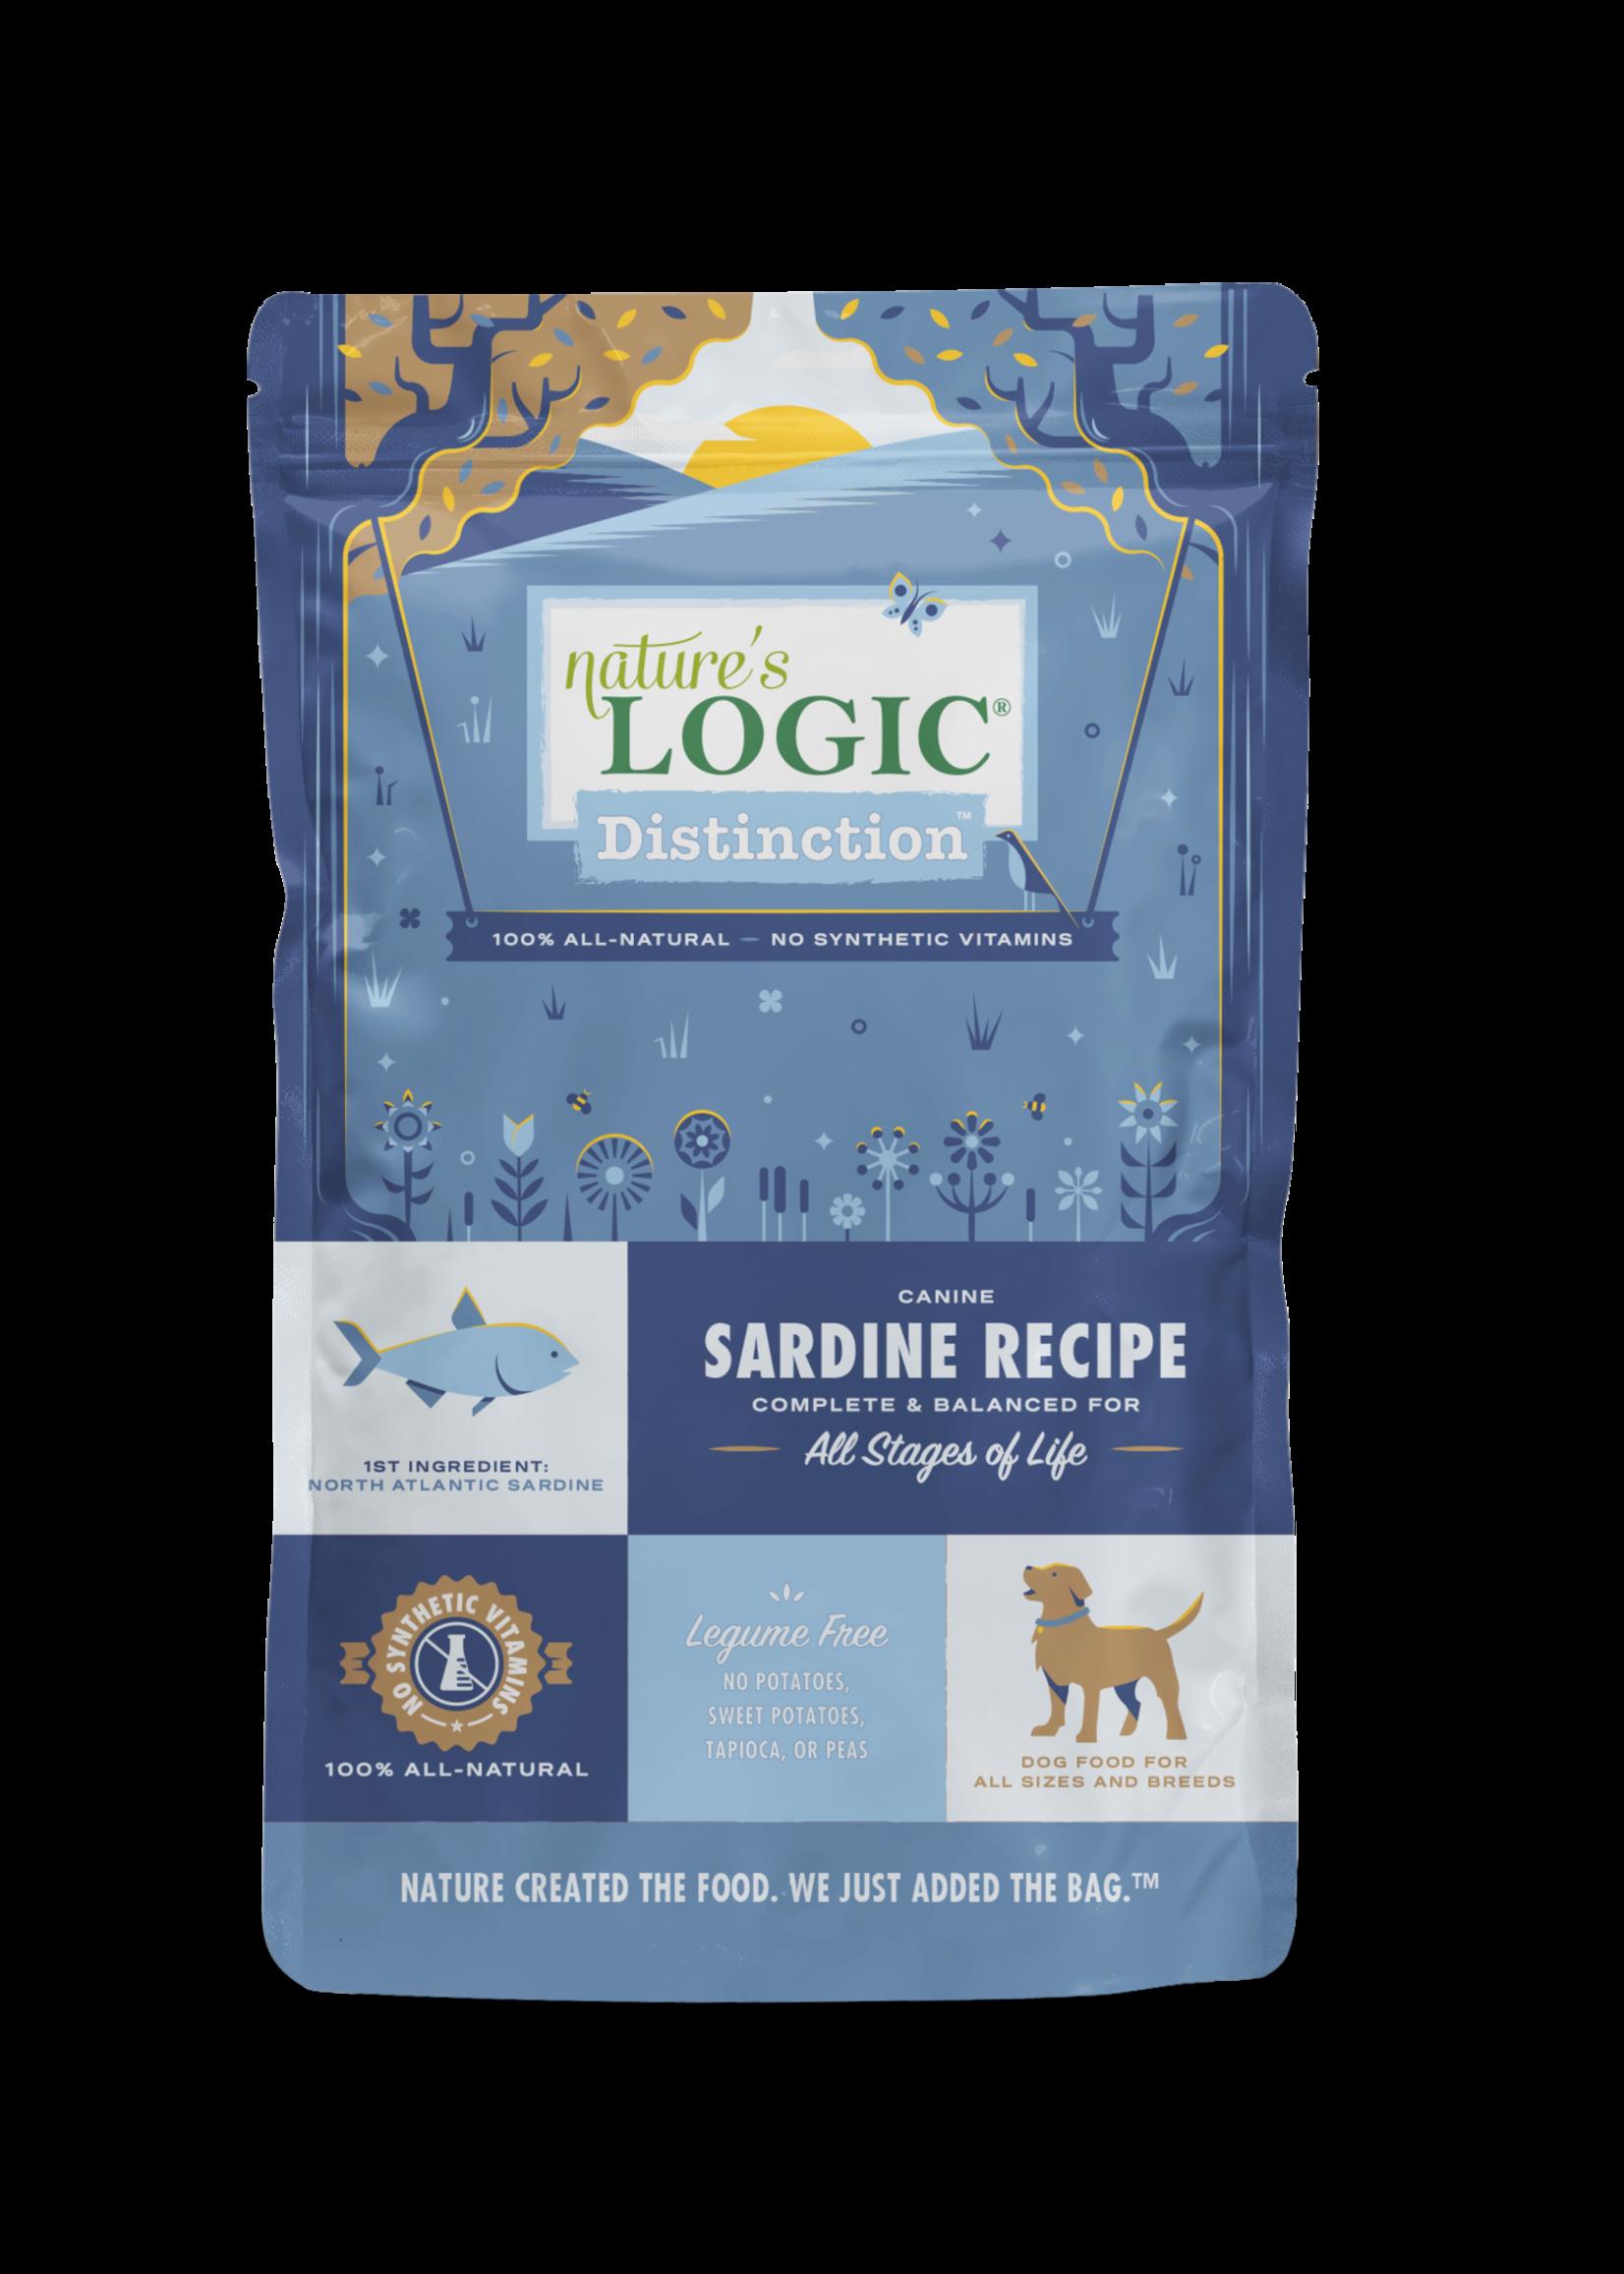 Nature's Logic Nature's Logic Distinction Sardine Dry Dog Food 12lbs